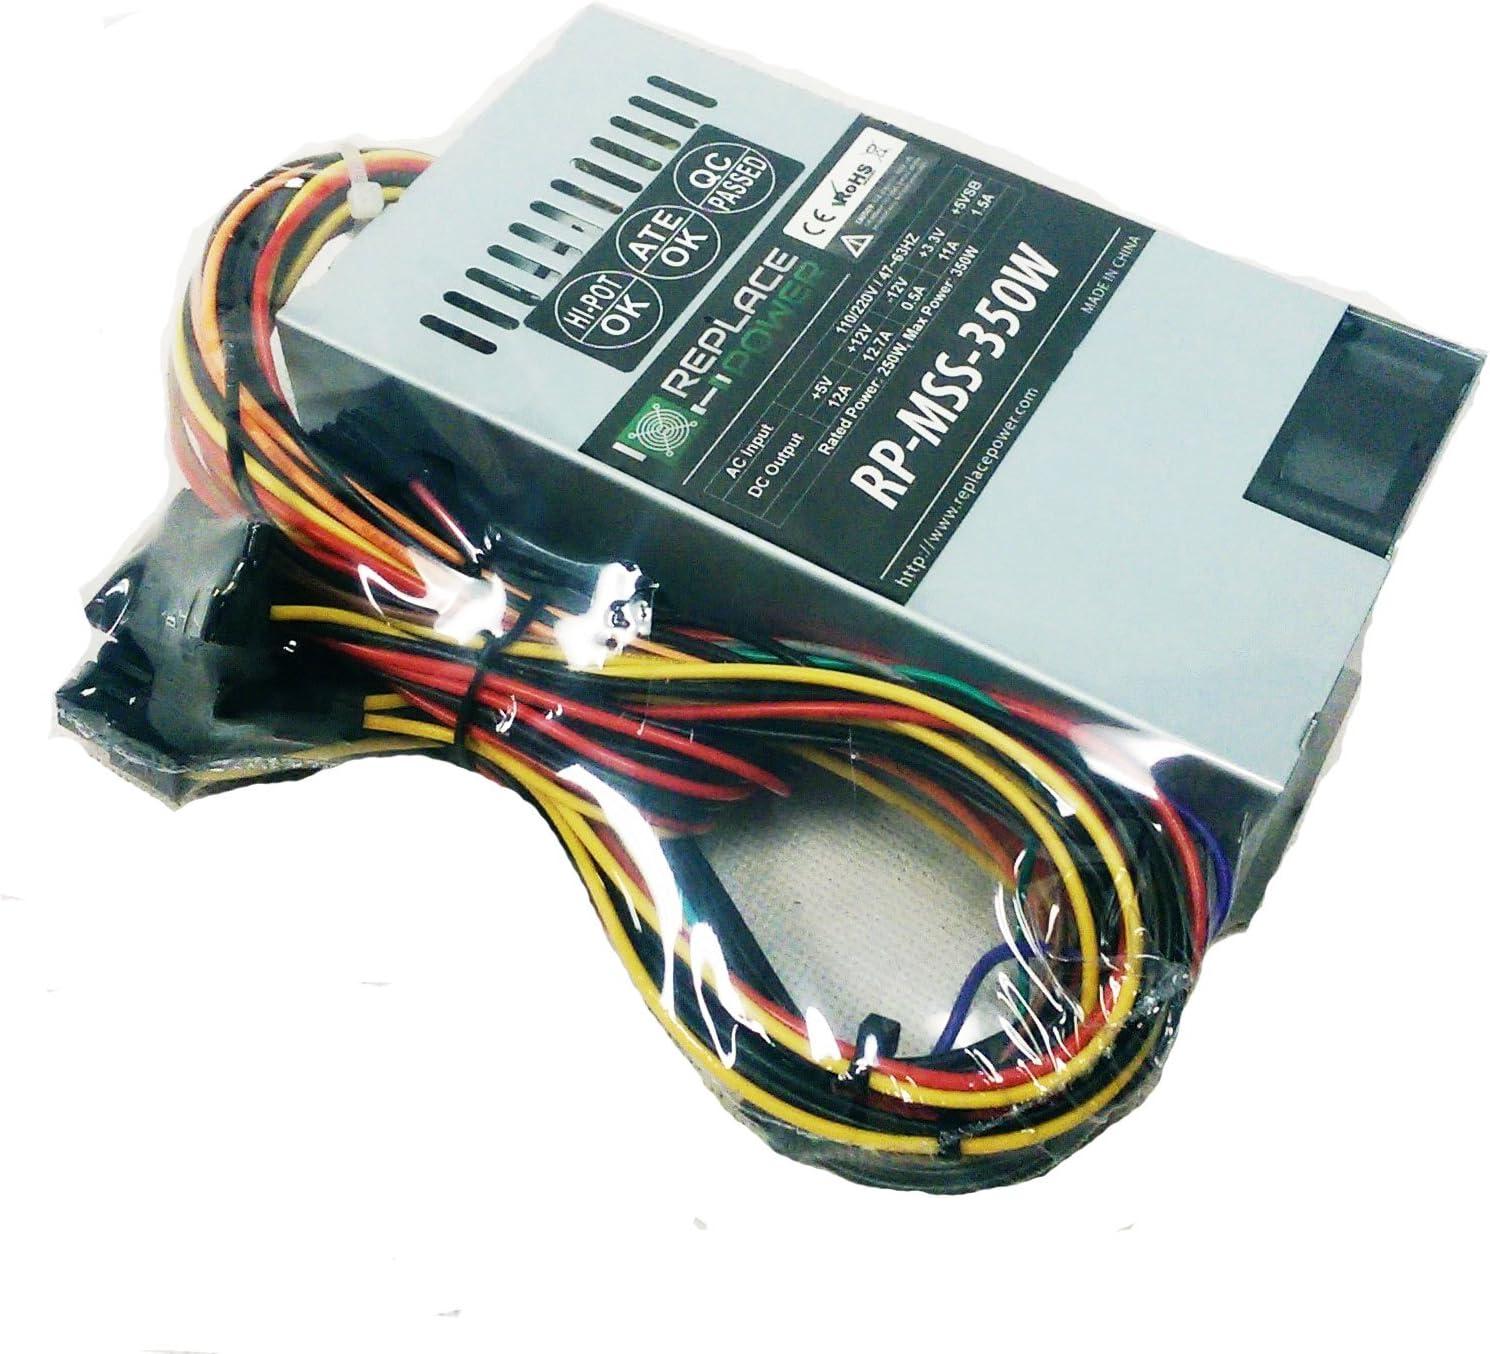 Replace Power 350W Supply for HP MediaSmart Server EX475 Delta GPS-200AB C